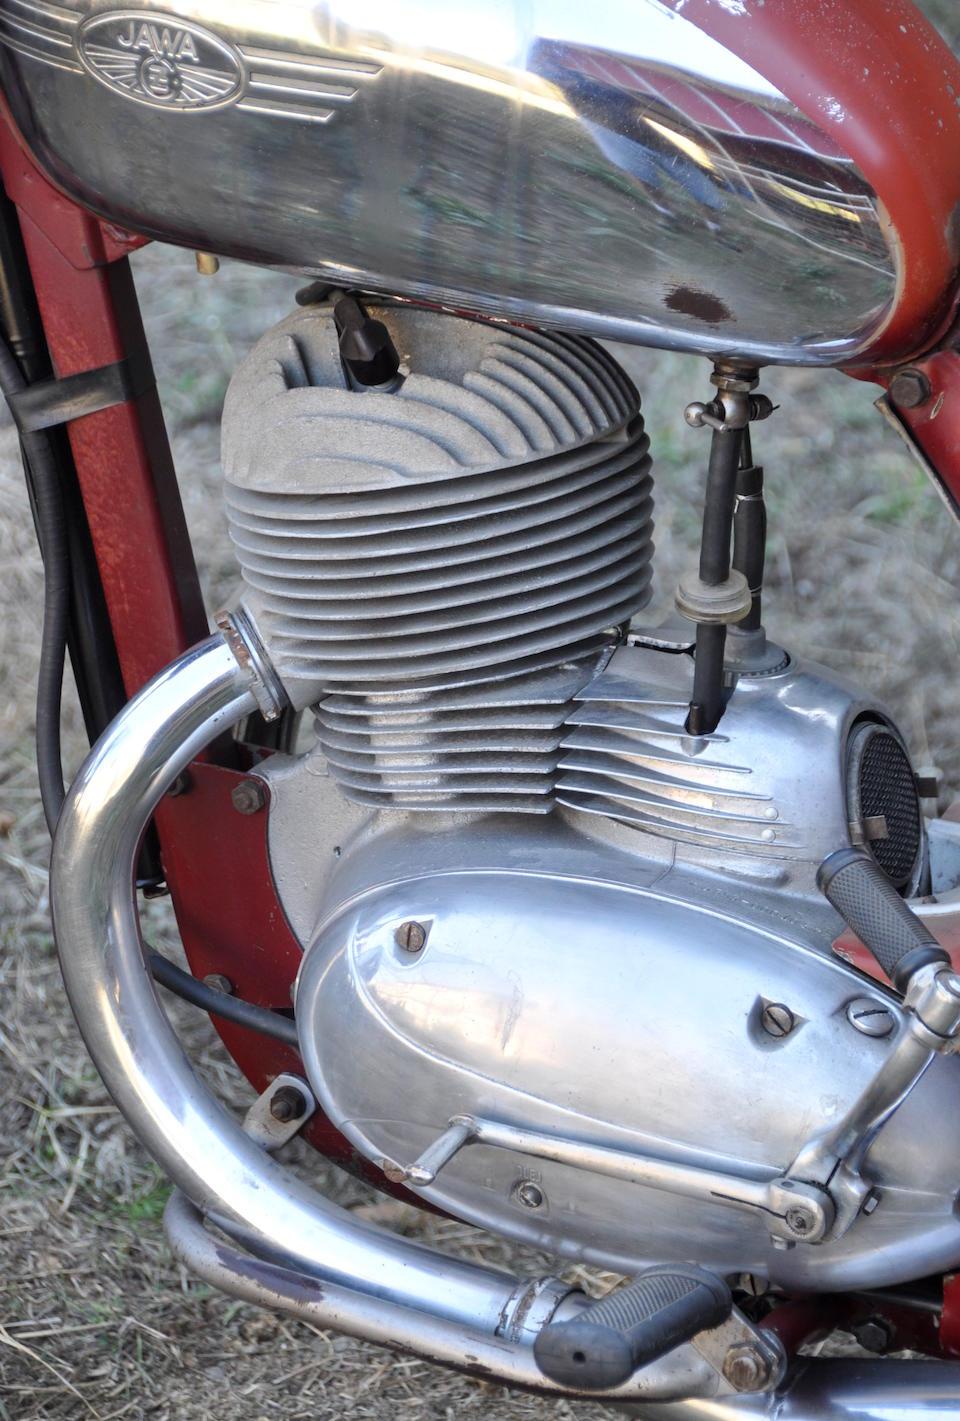 1957 Jawa 250cc ISDT Replica Engine no. S353-000103